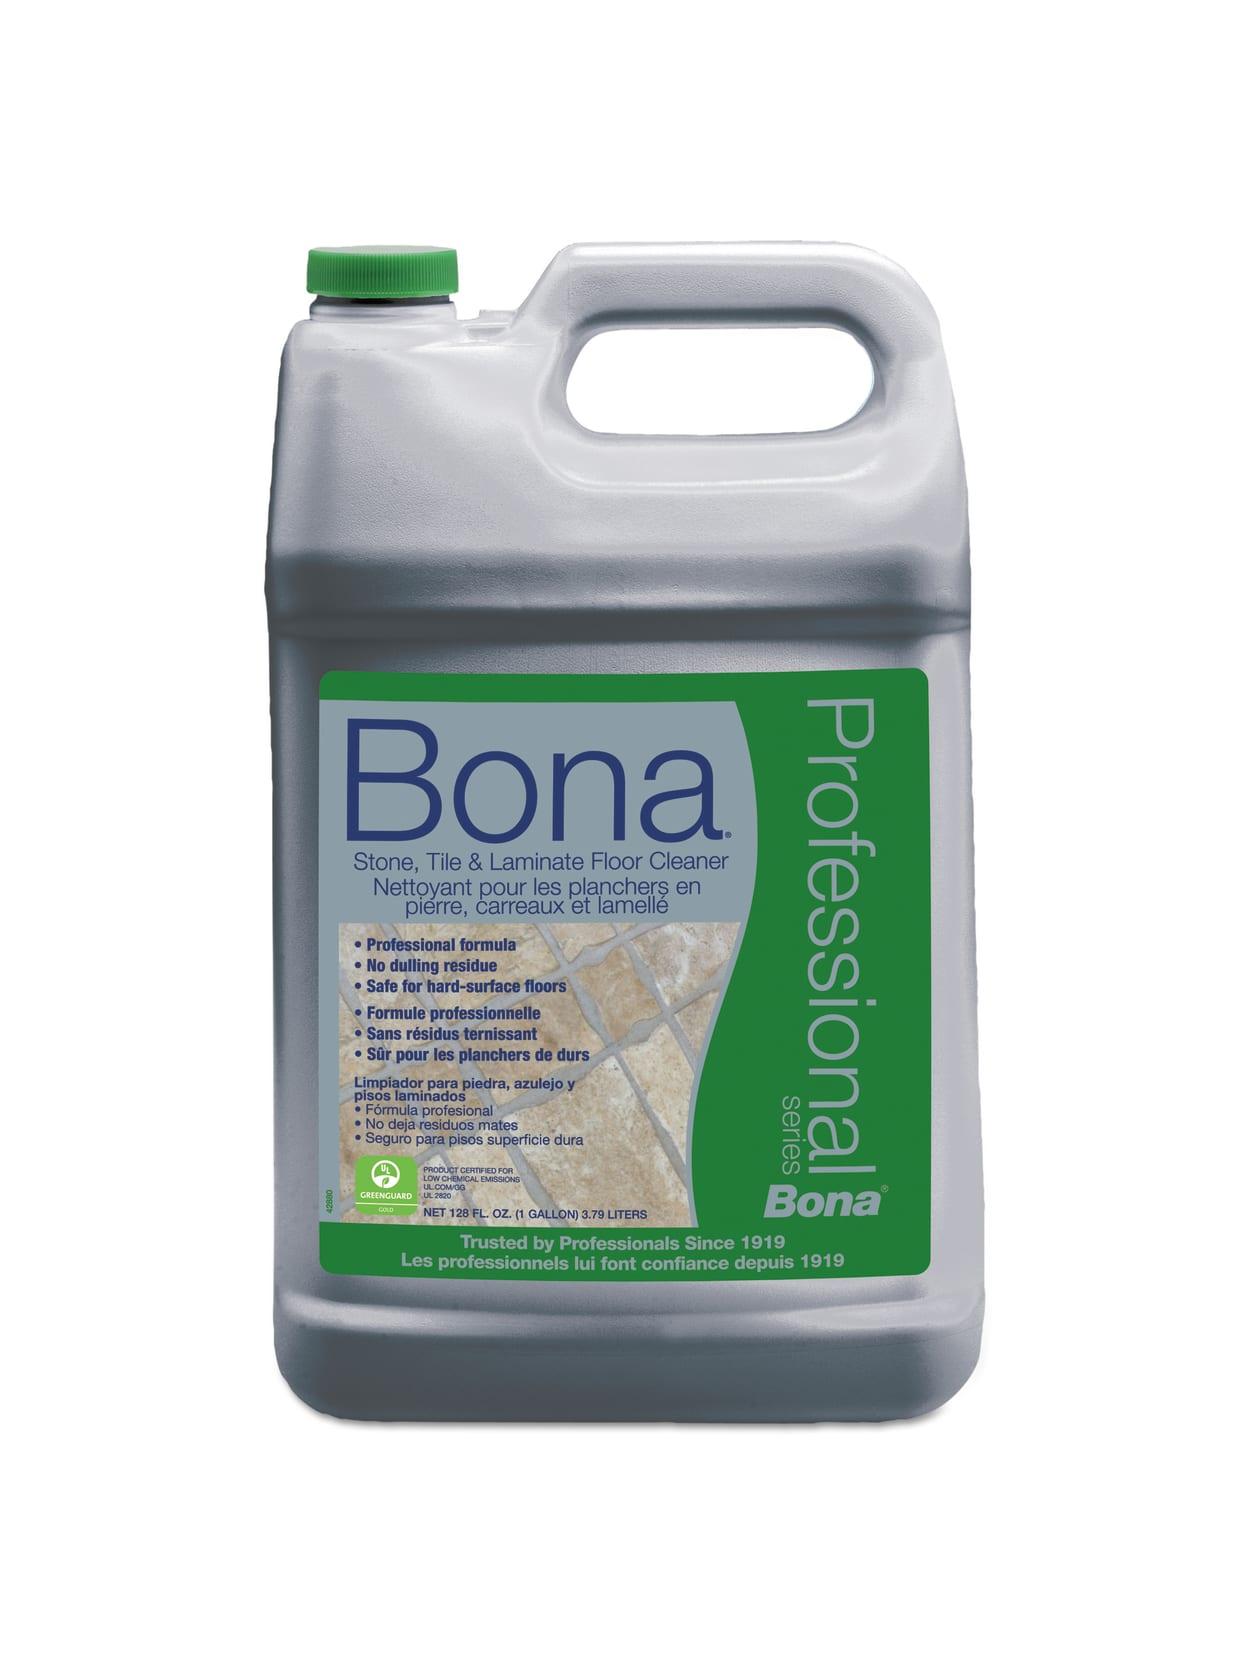 Bona Stone Tile And Laminate Floor